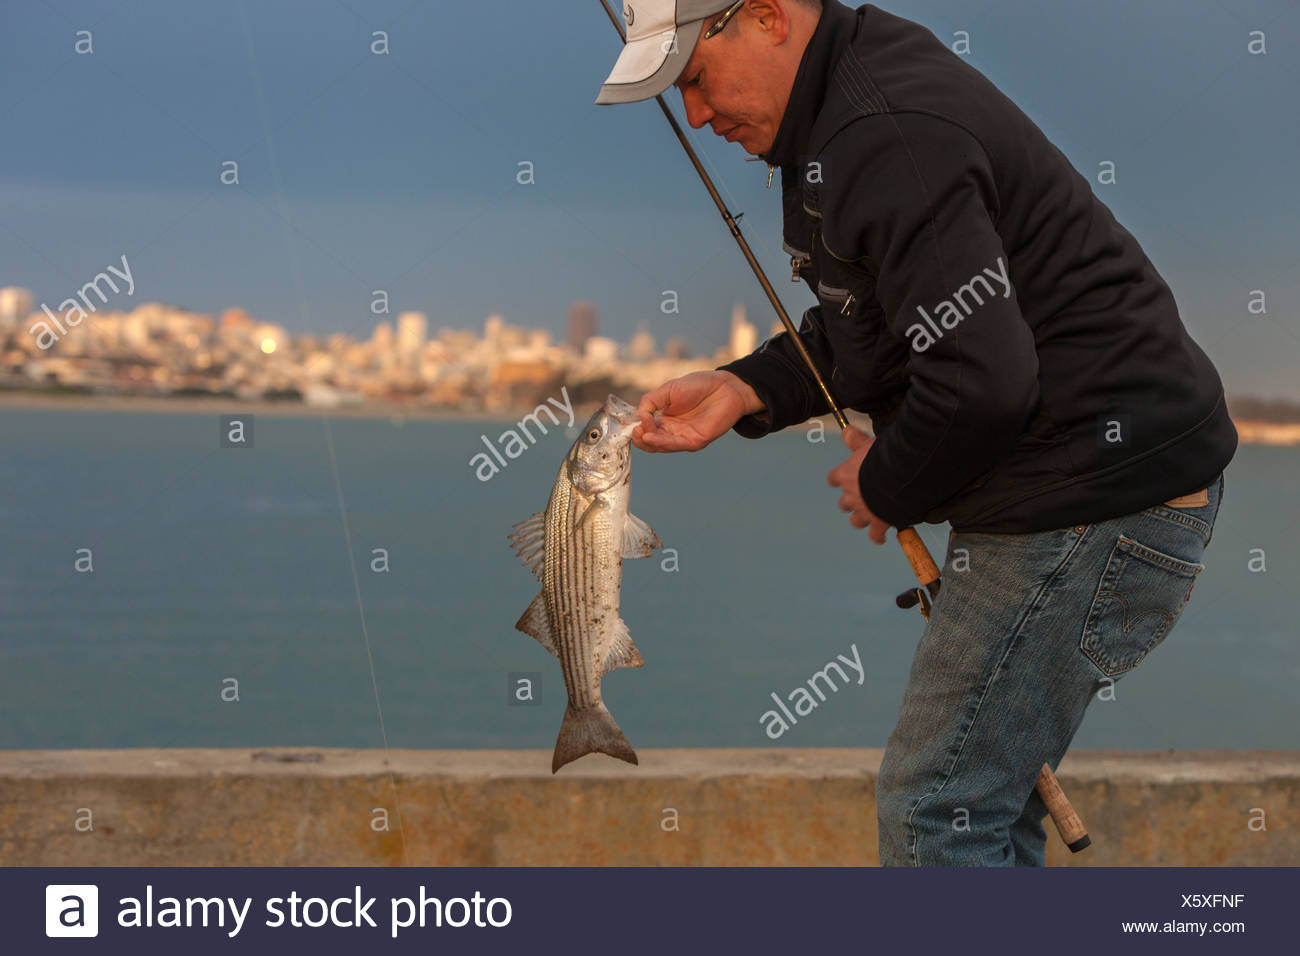 fisherman holding caught striped bass (Morone saxatilis), Golden Gate Pier, San Francisco, California, USA - Stock Image